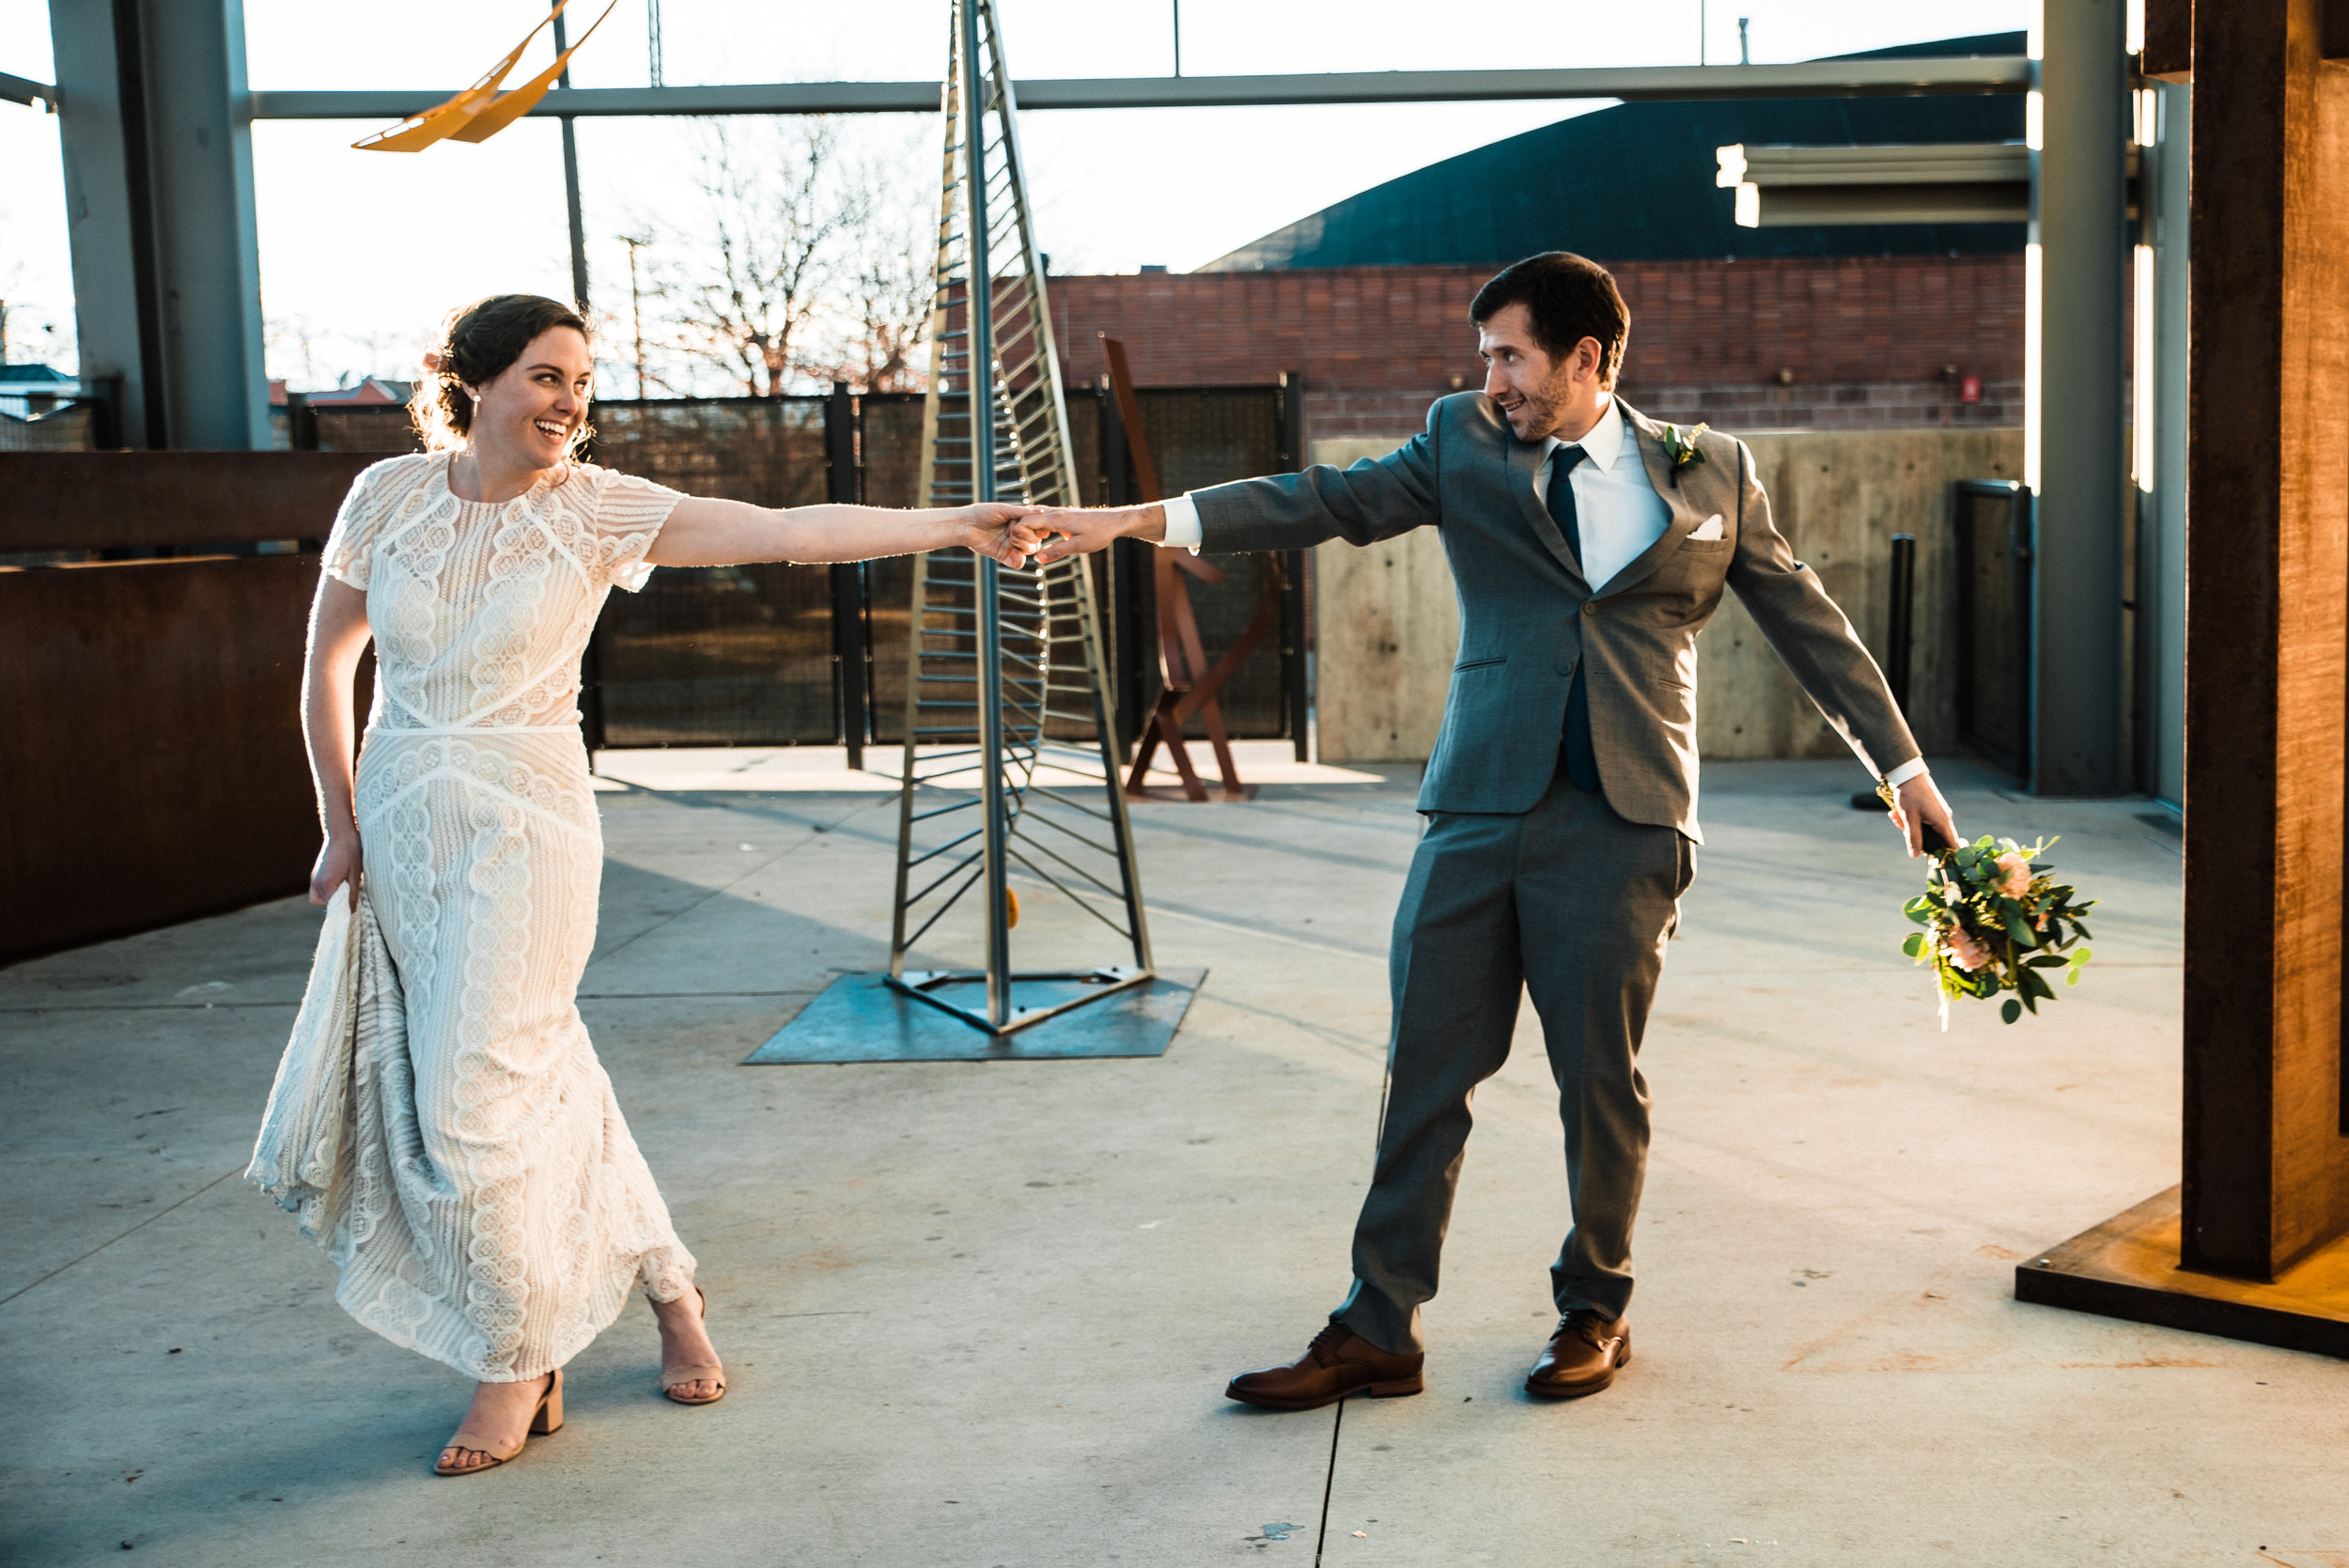 Wedding dancing at Space Gallery sculpture garden at intimate Colorado wedding-Best Colorado Wedding Photographer